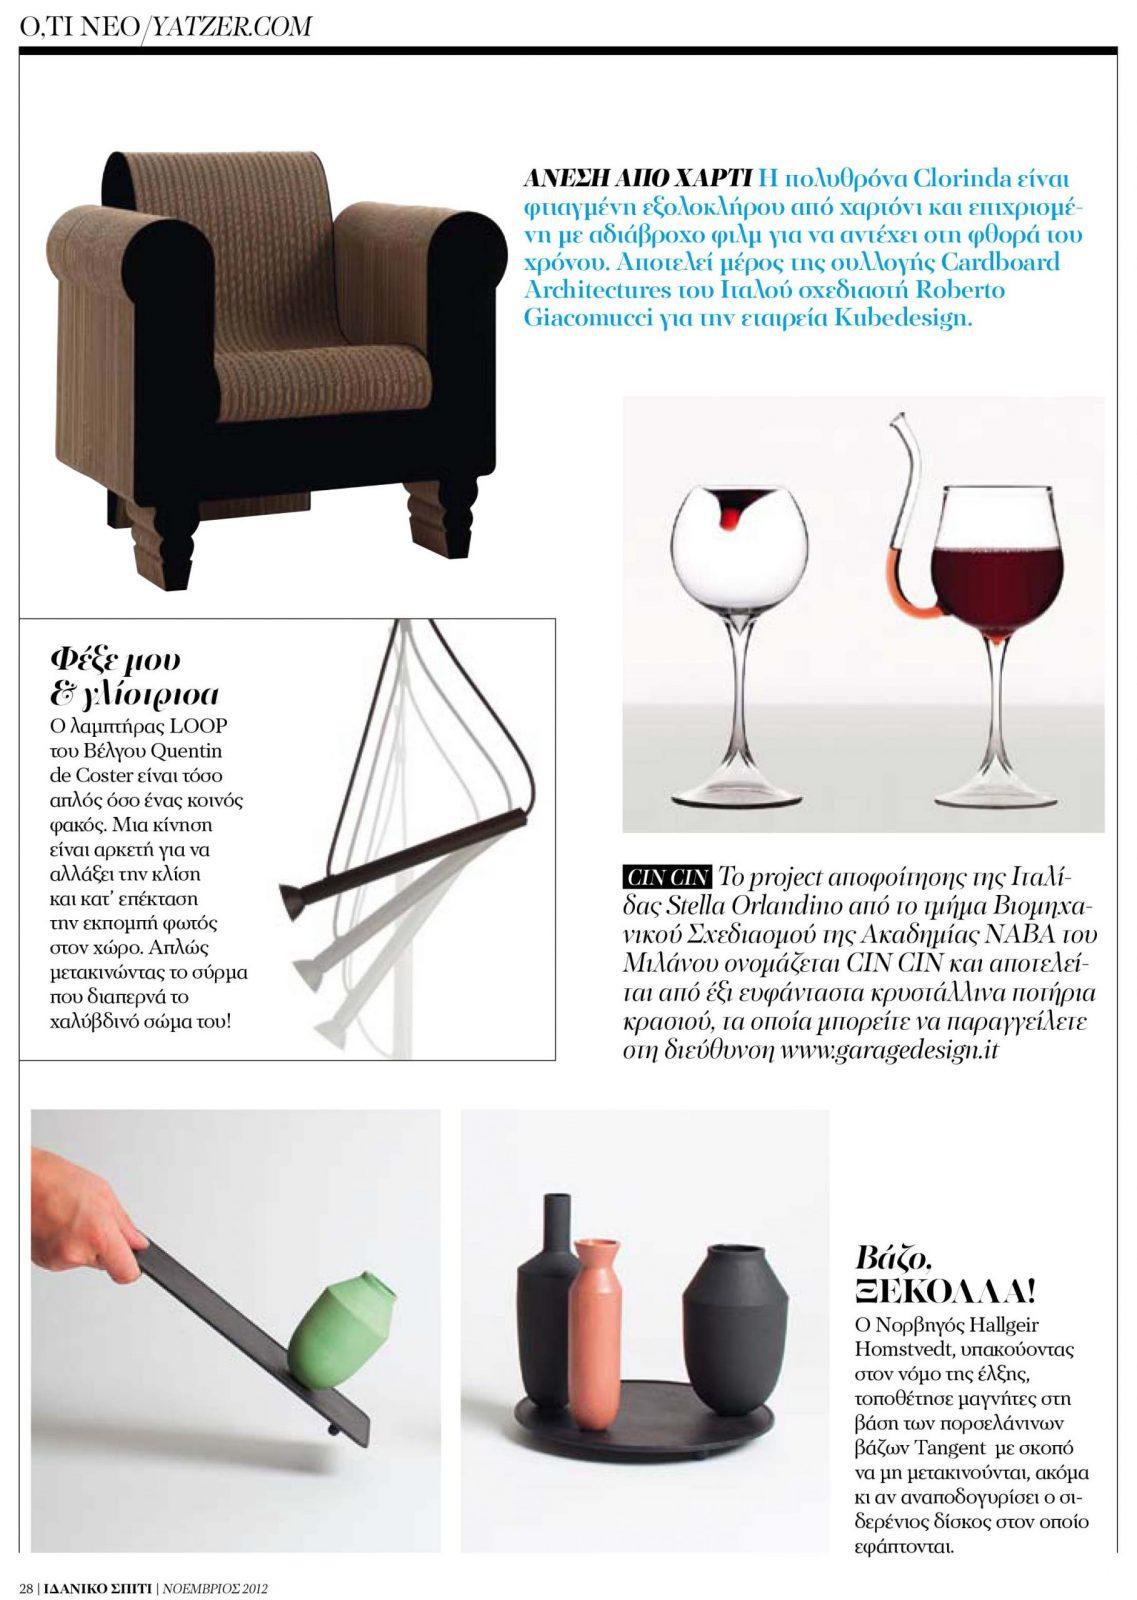 Greek Interior Design magazine, Cin cin wine glasses, Stella Orlandino design